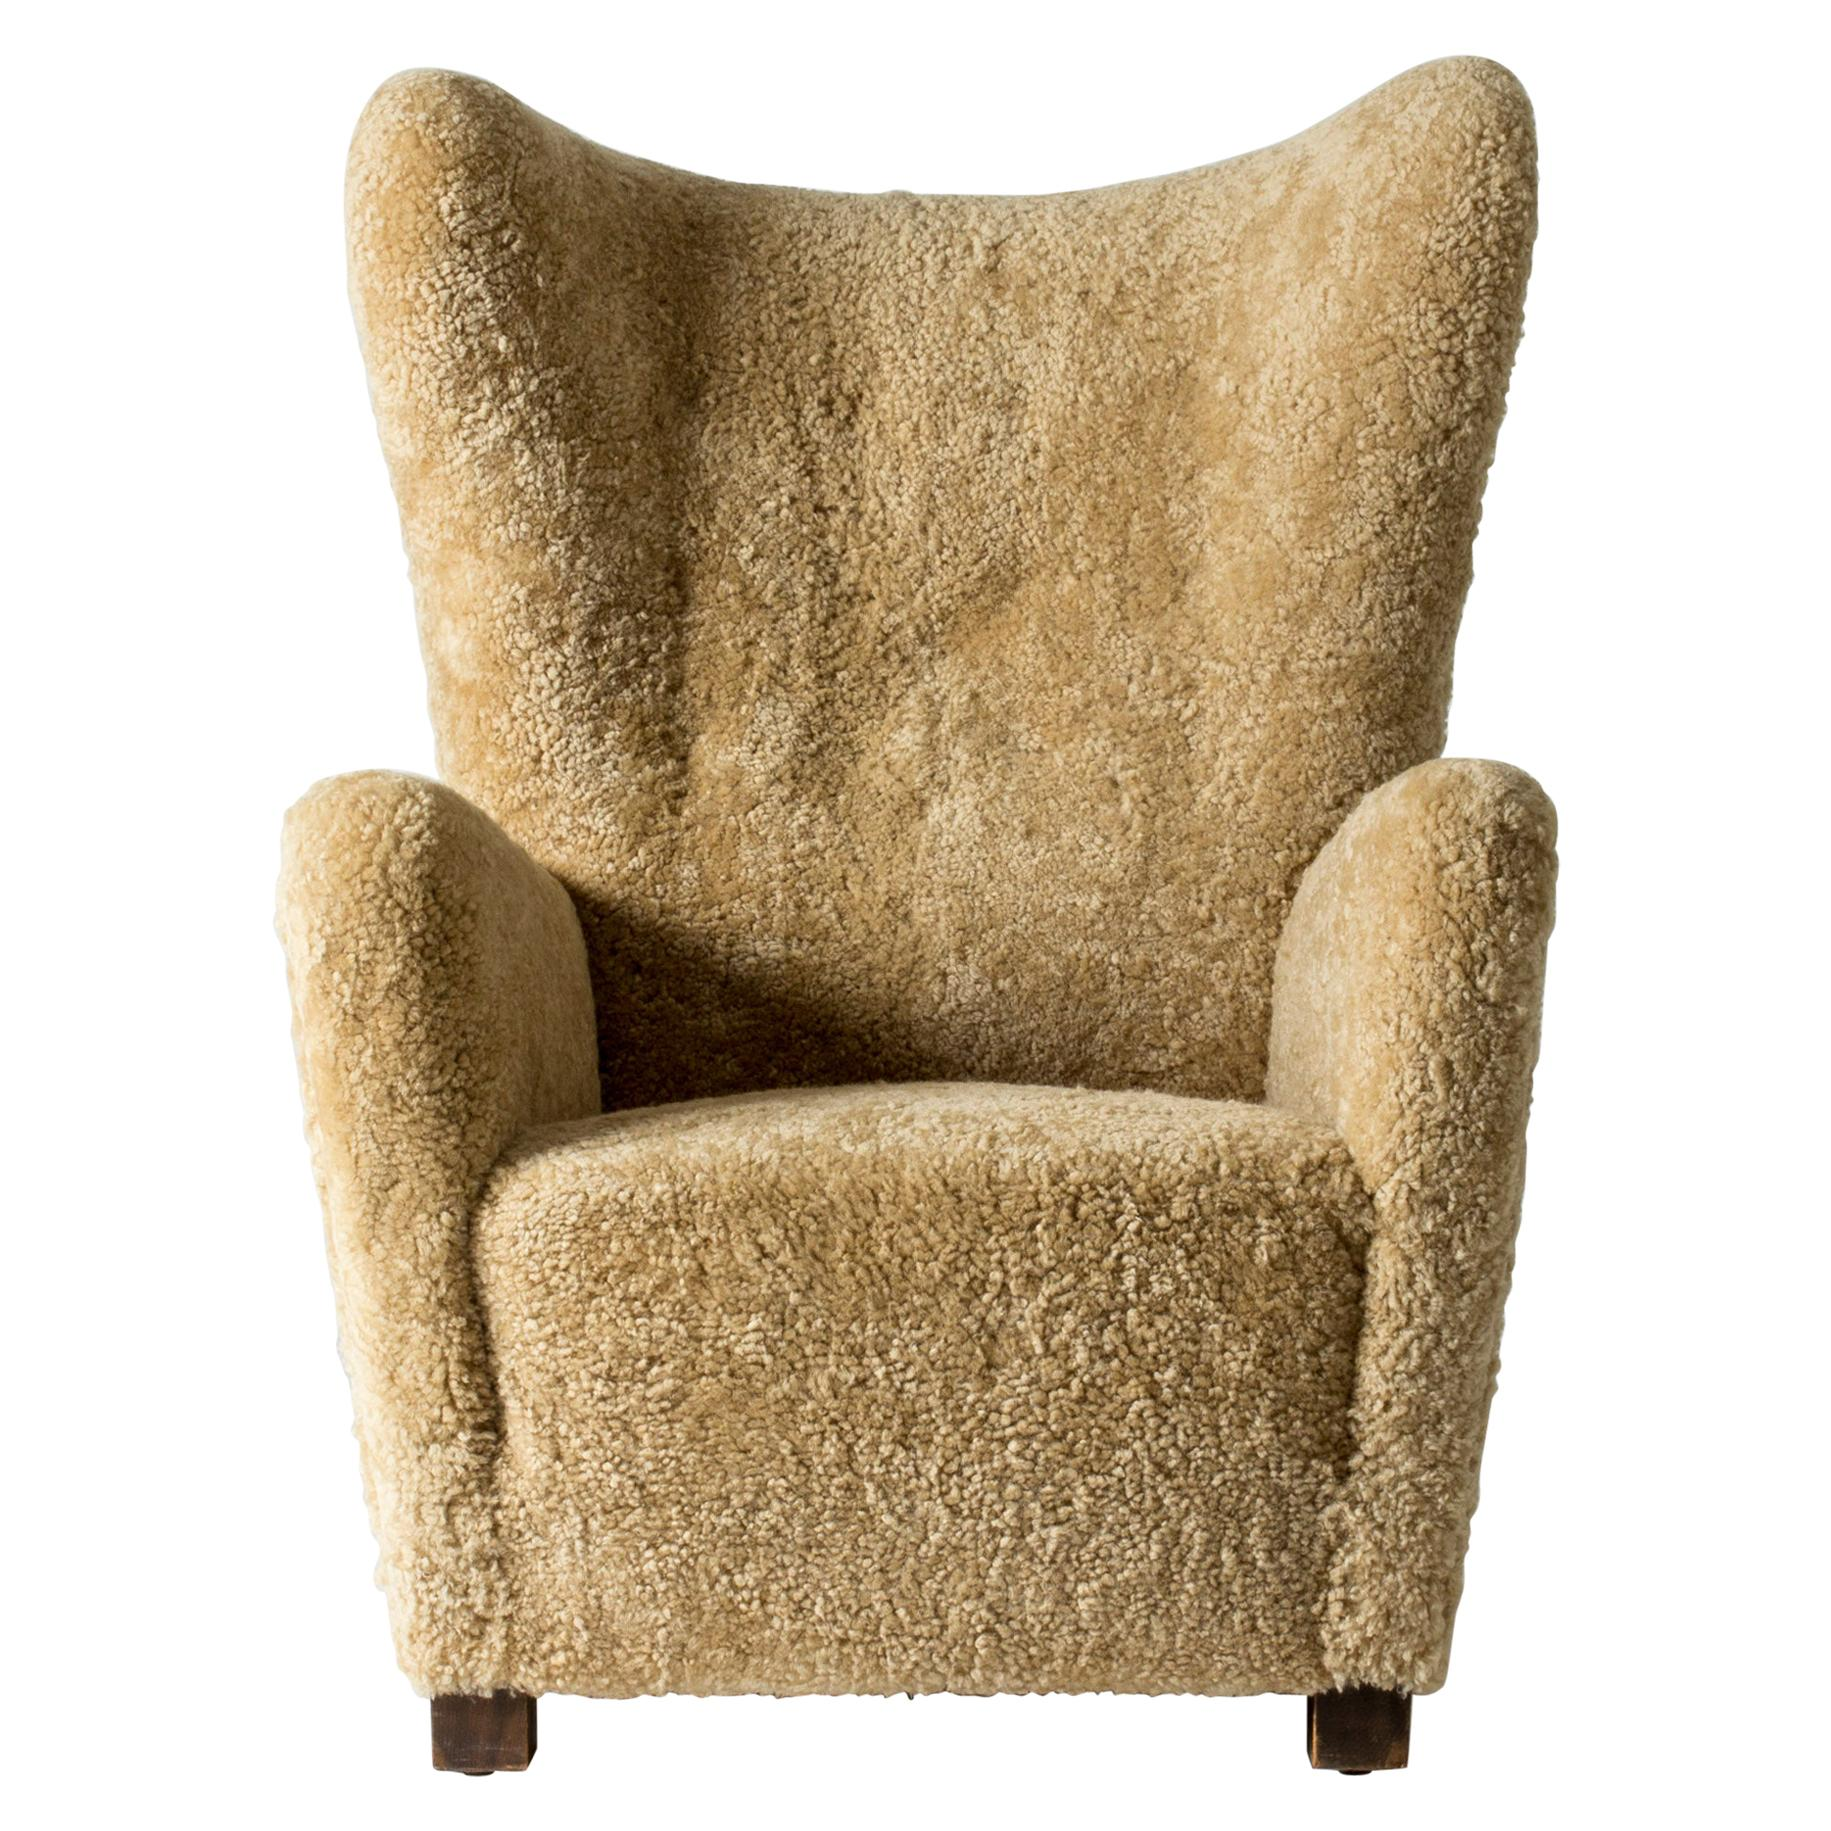 Sheepskin Armchair/Lounge Chair from Fritz Hansen, Denmark, 1930s